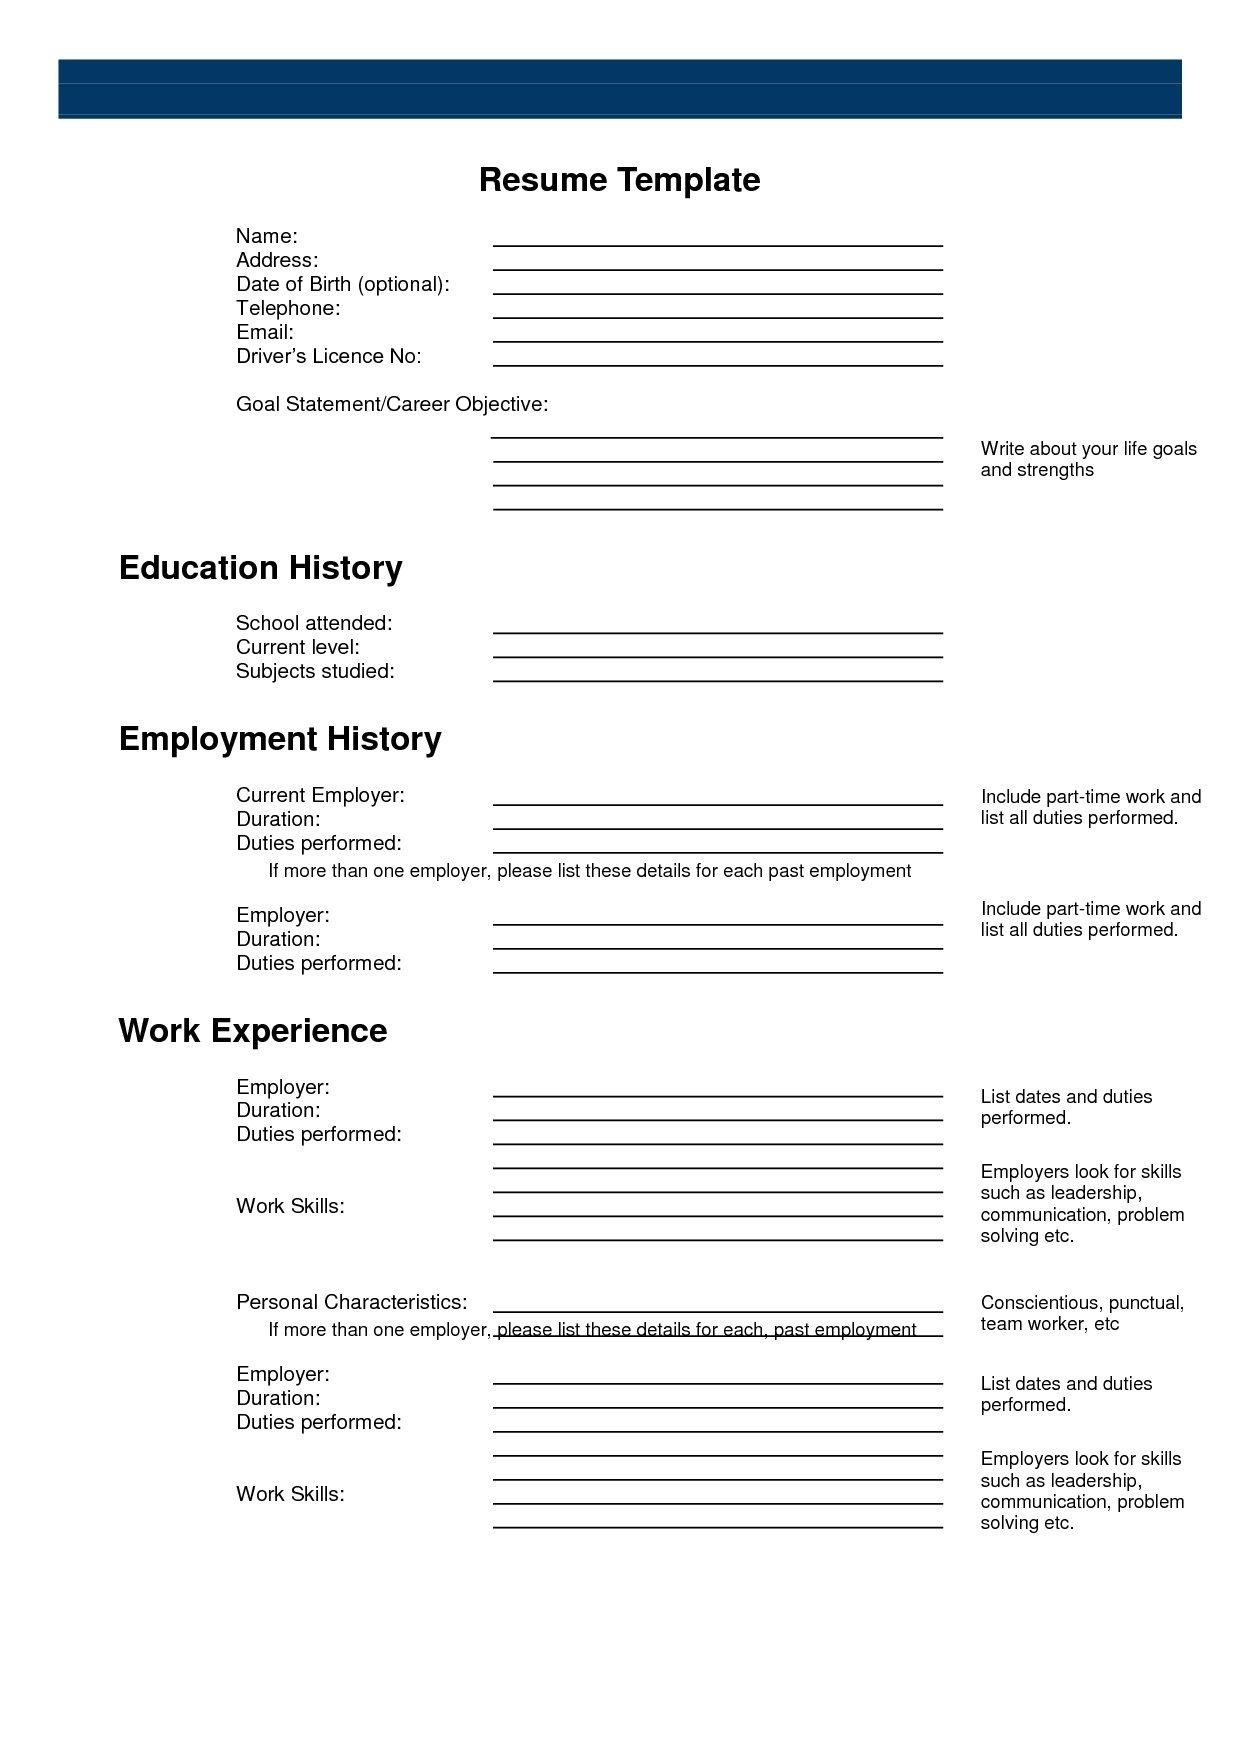 Printable | Work | Free Printable Resume, Free Printable Resume - Free Online Resume Templates Printable